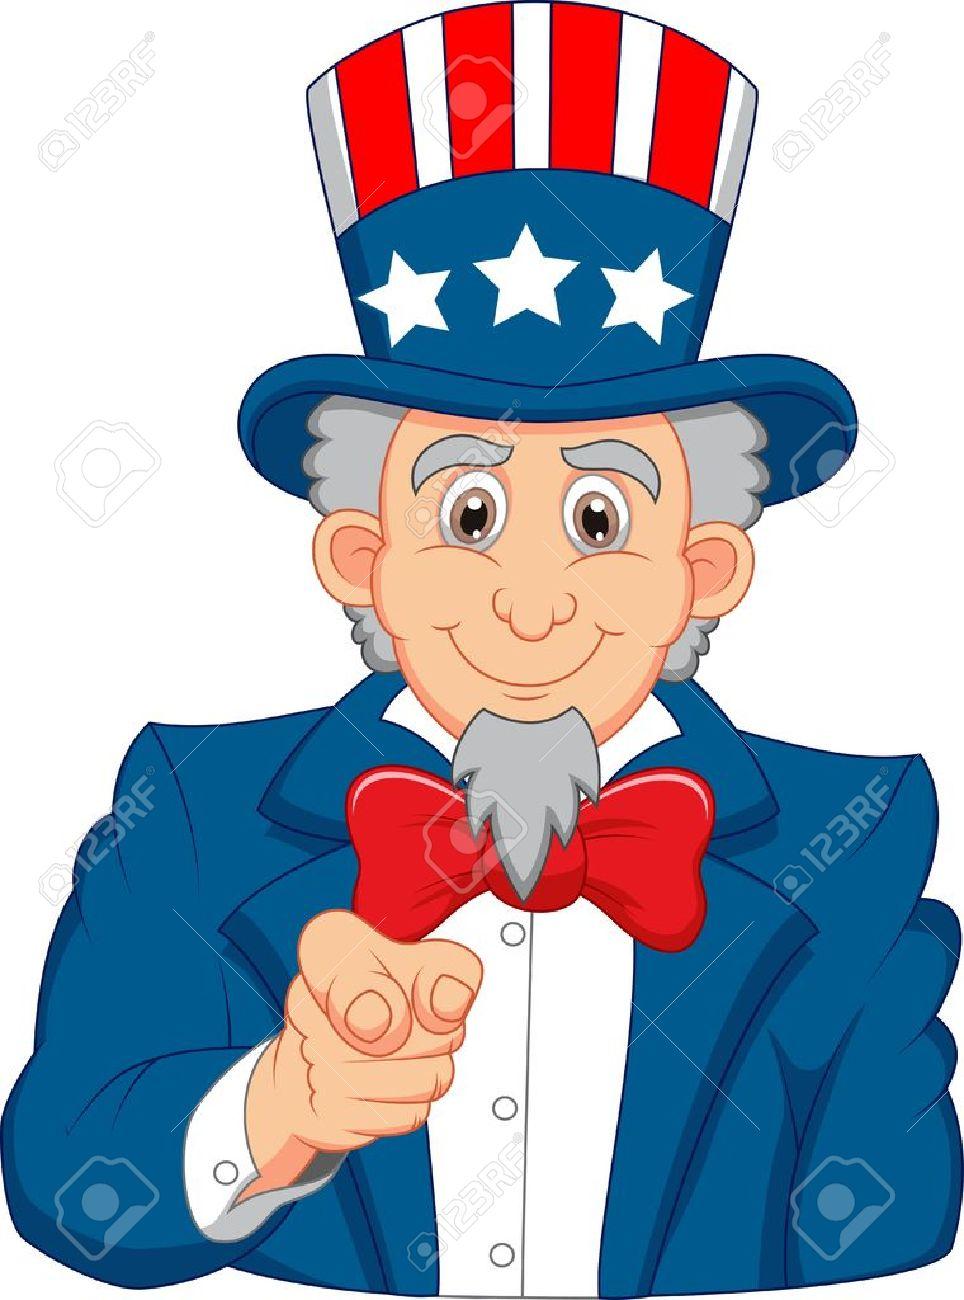 uncle sam cartoon wants you royalty free cliparts vectors and rh 123rf com Free Star Clip Art uncle sam i want you free clip art